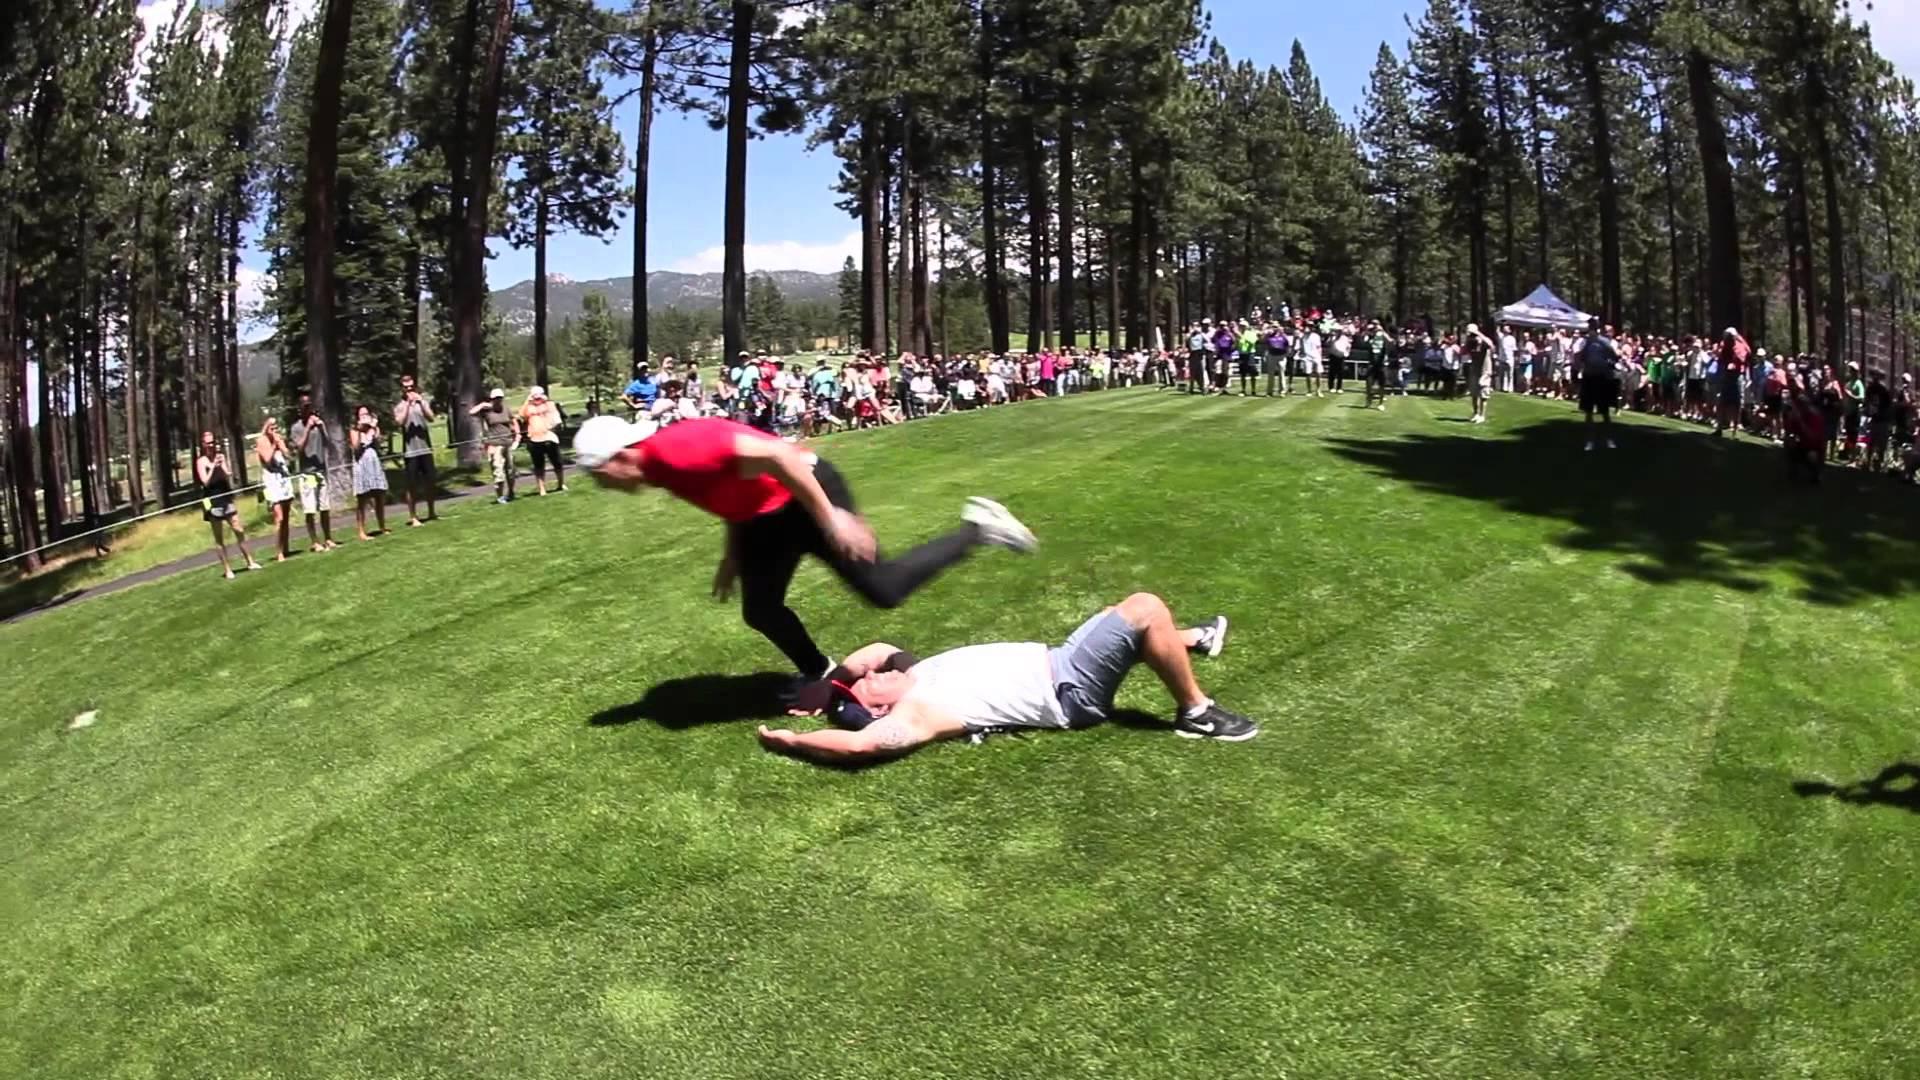 AJ Hawk destroys a patron on the golf course with a massive tackle